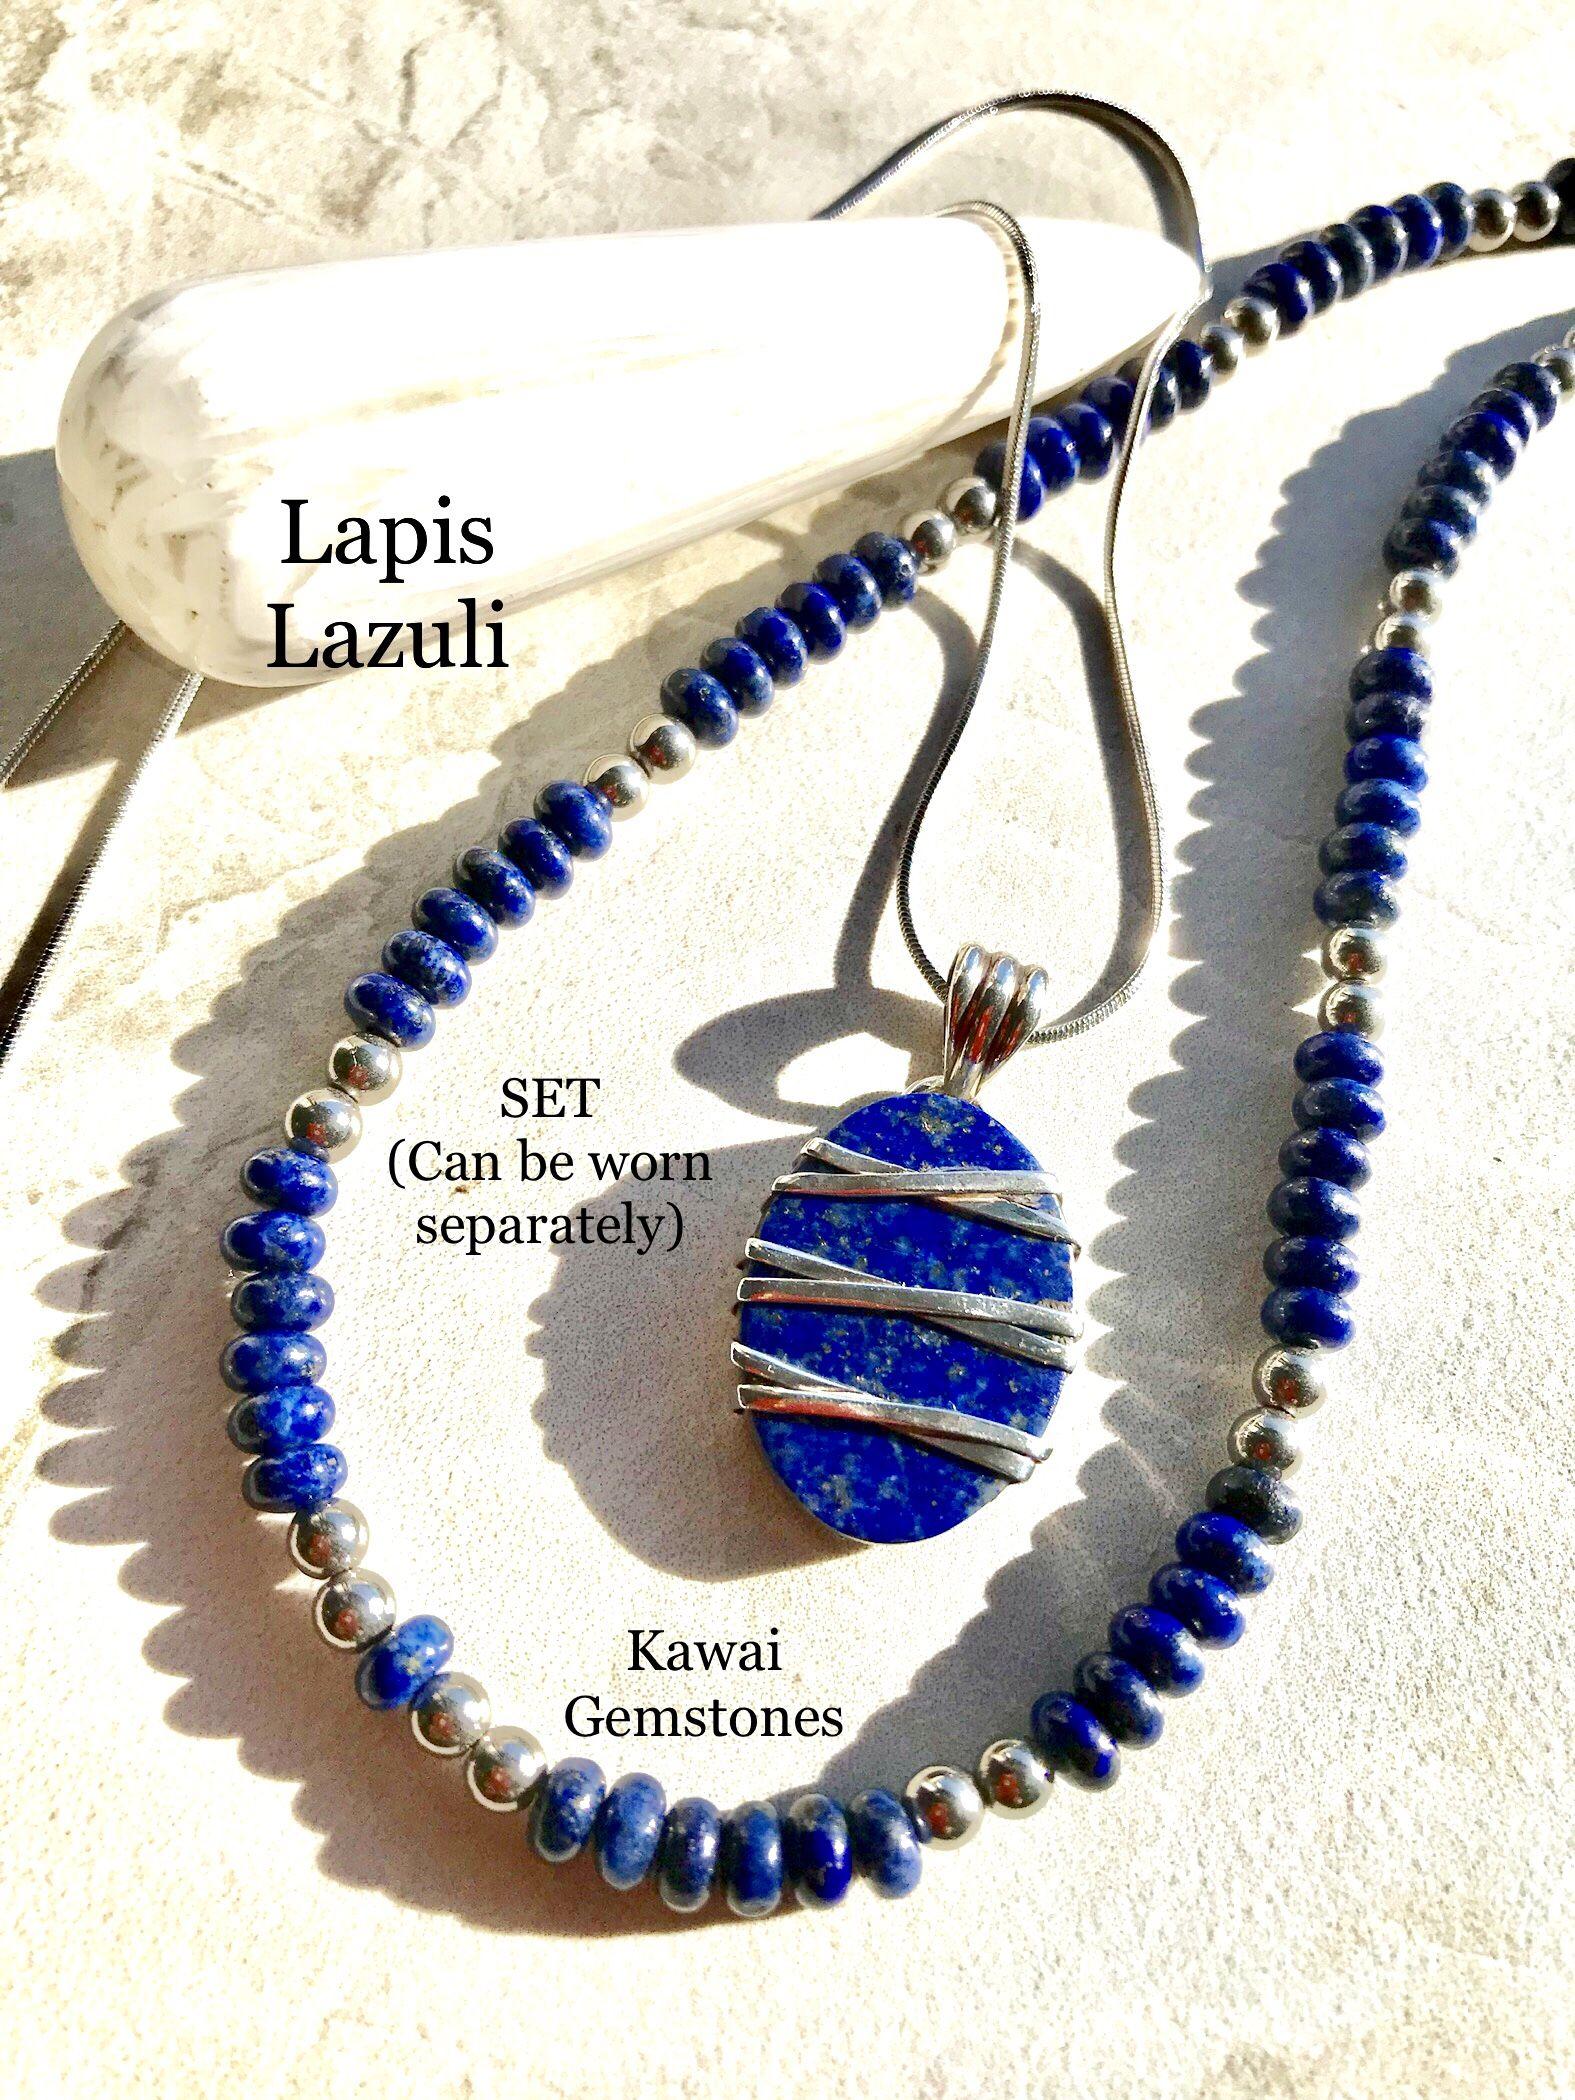 LAPIS LAZULI STONE NECKLACE EARRINGS SET Bee Genuine Rock Gem Pendant Gold Blue